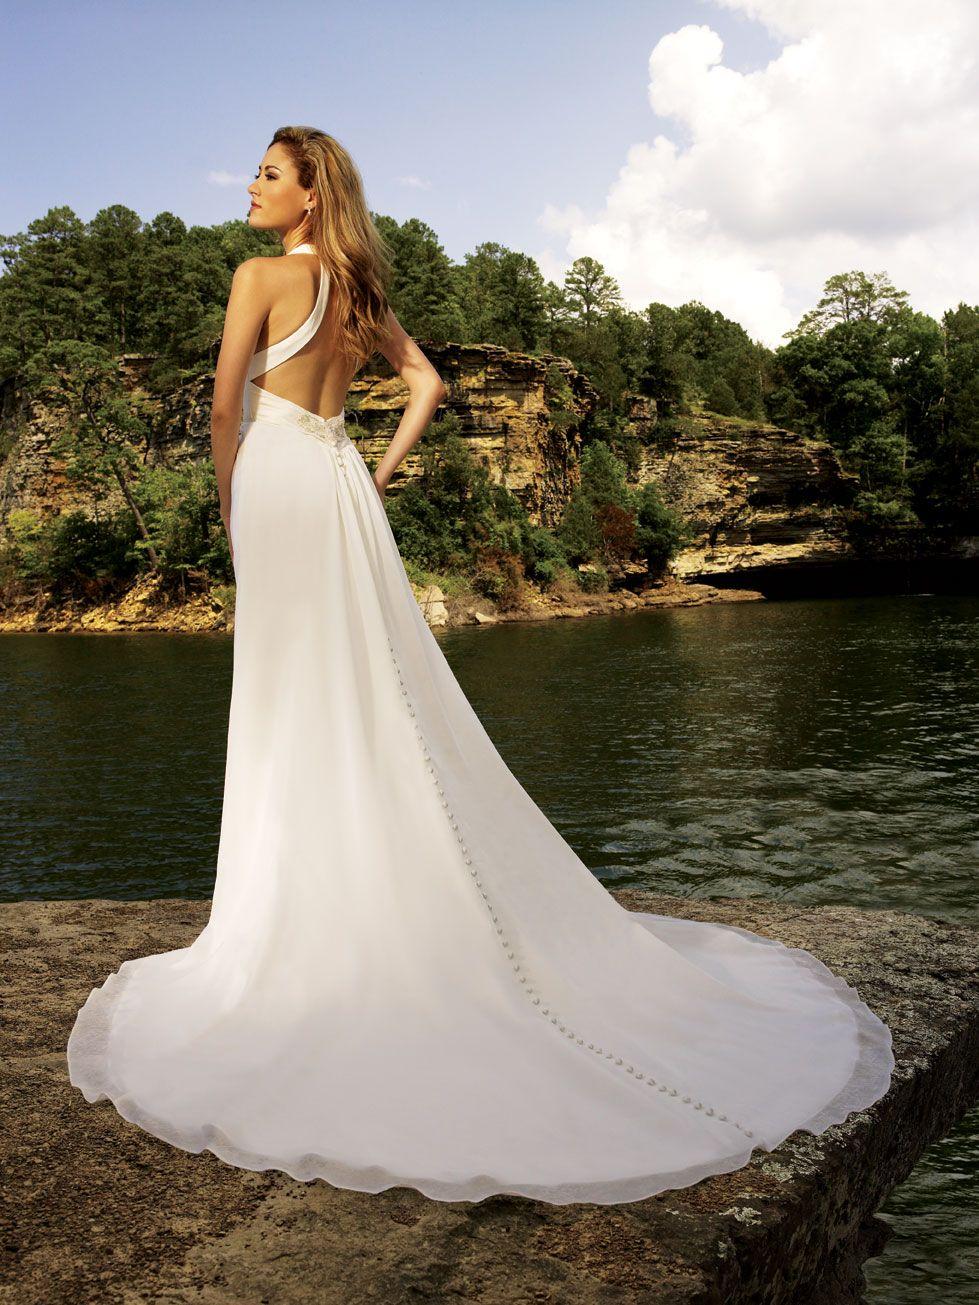 Allure bridalsu style colors whitesilver ivorysilver fabric